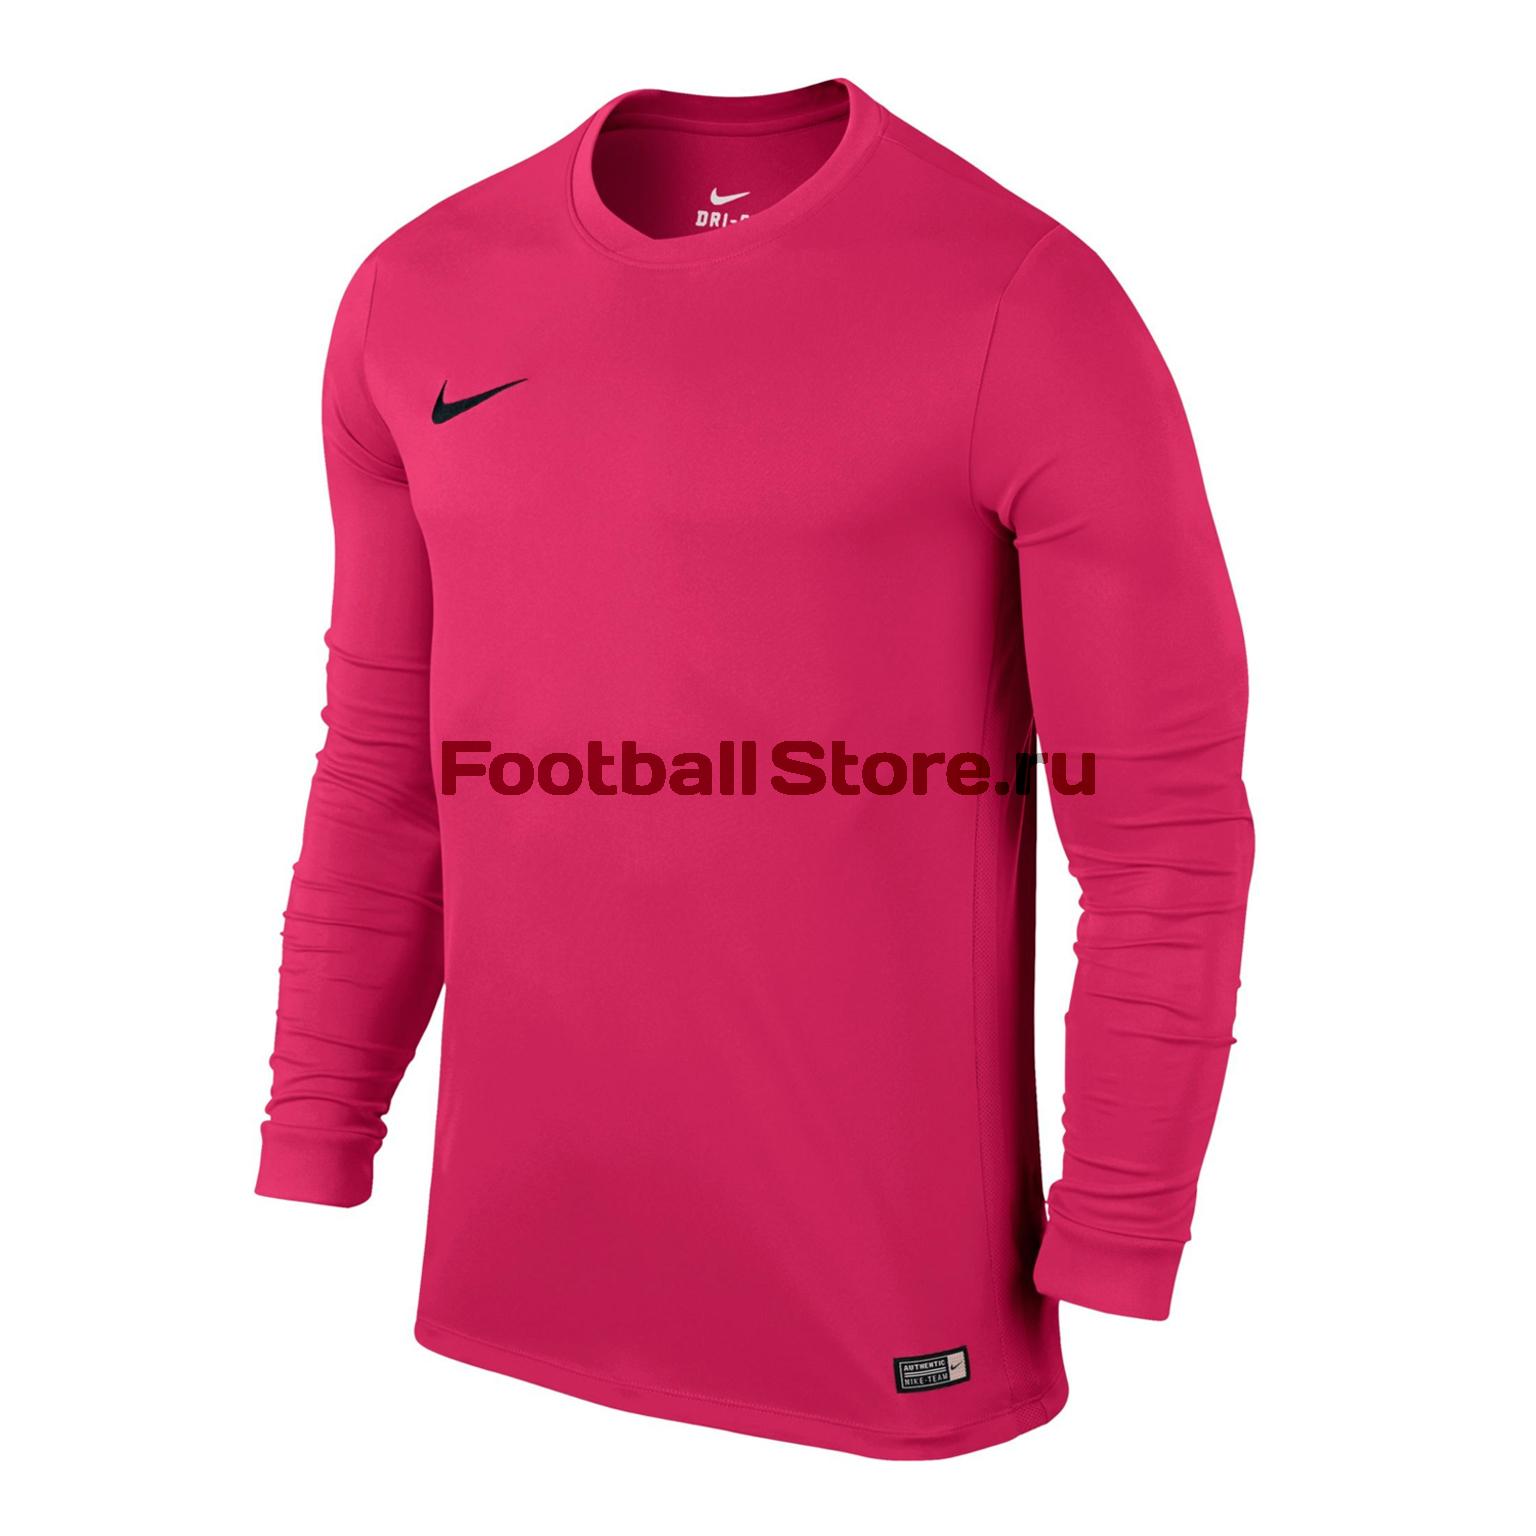 Футболка игровая Nike LS Park VI JSY 725884-616 футболка игровая nike dry tiempo prem jsy ss 894230 057